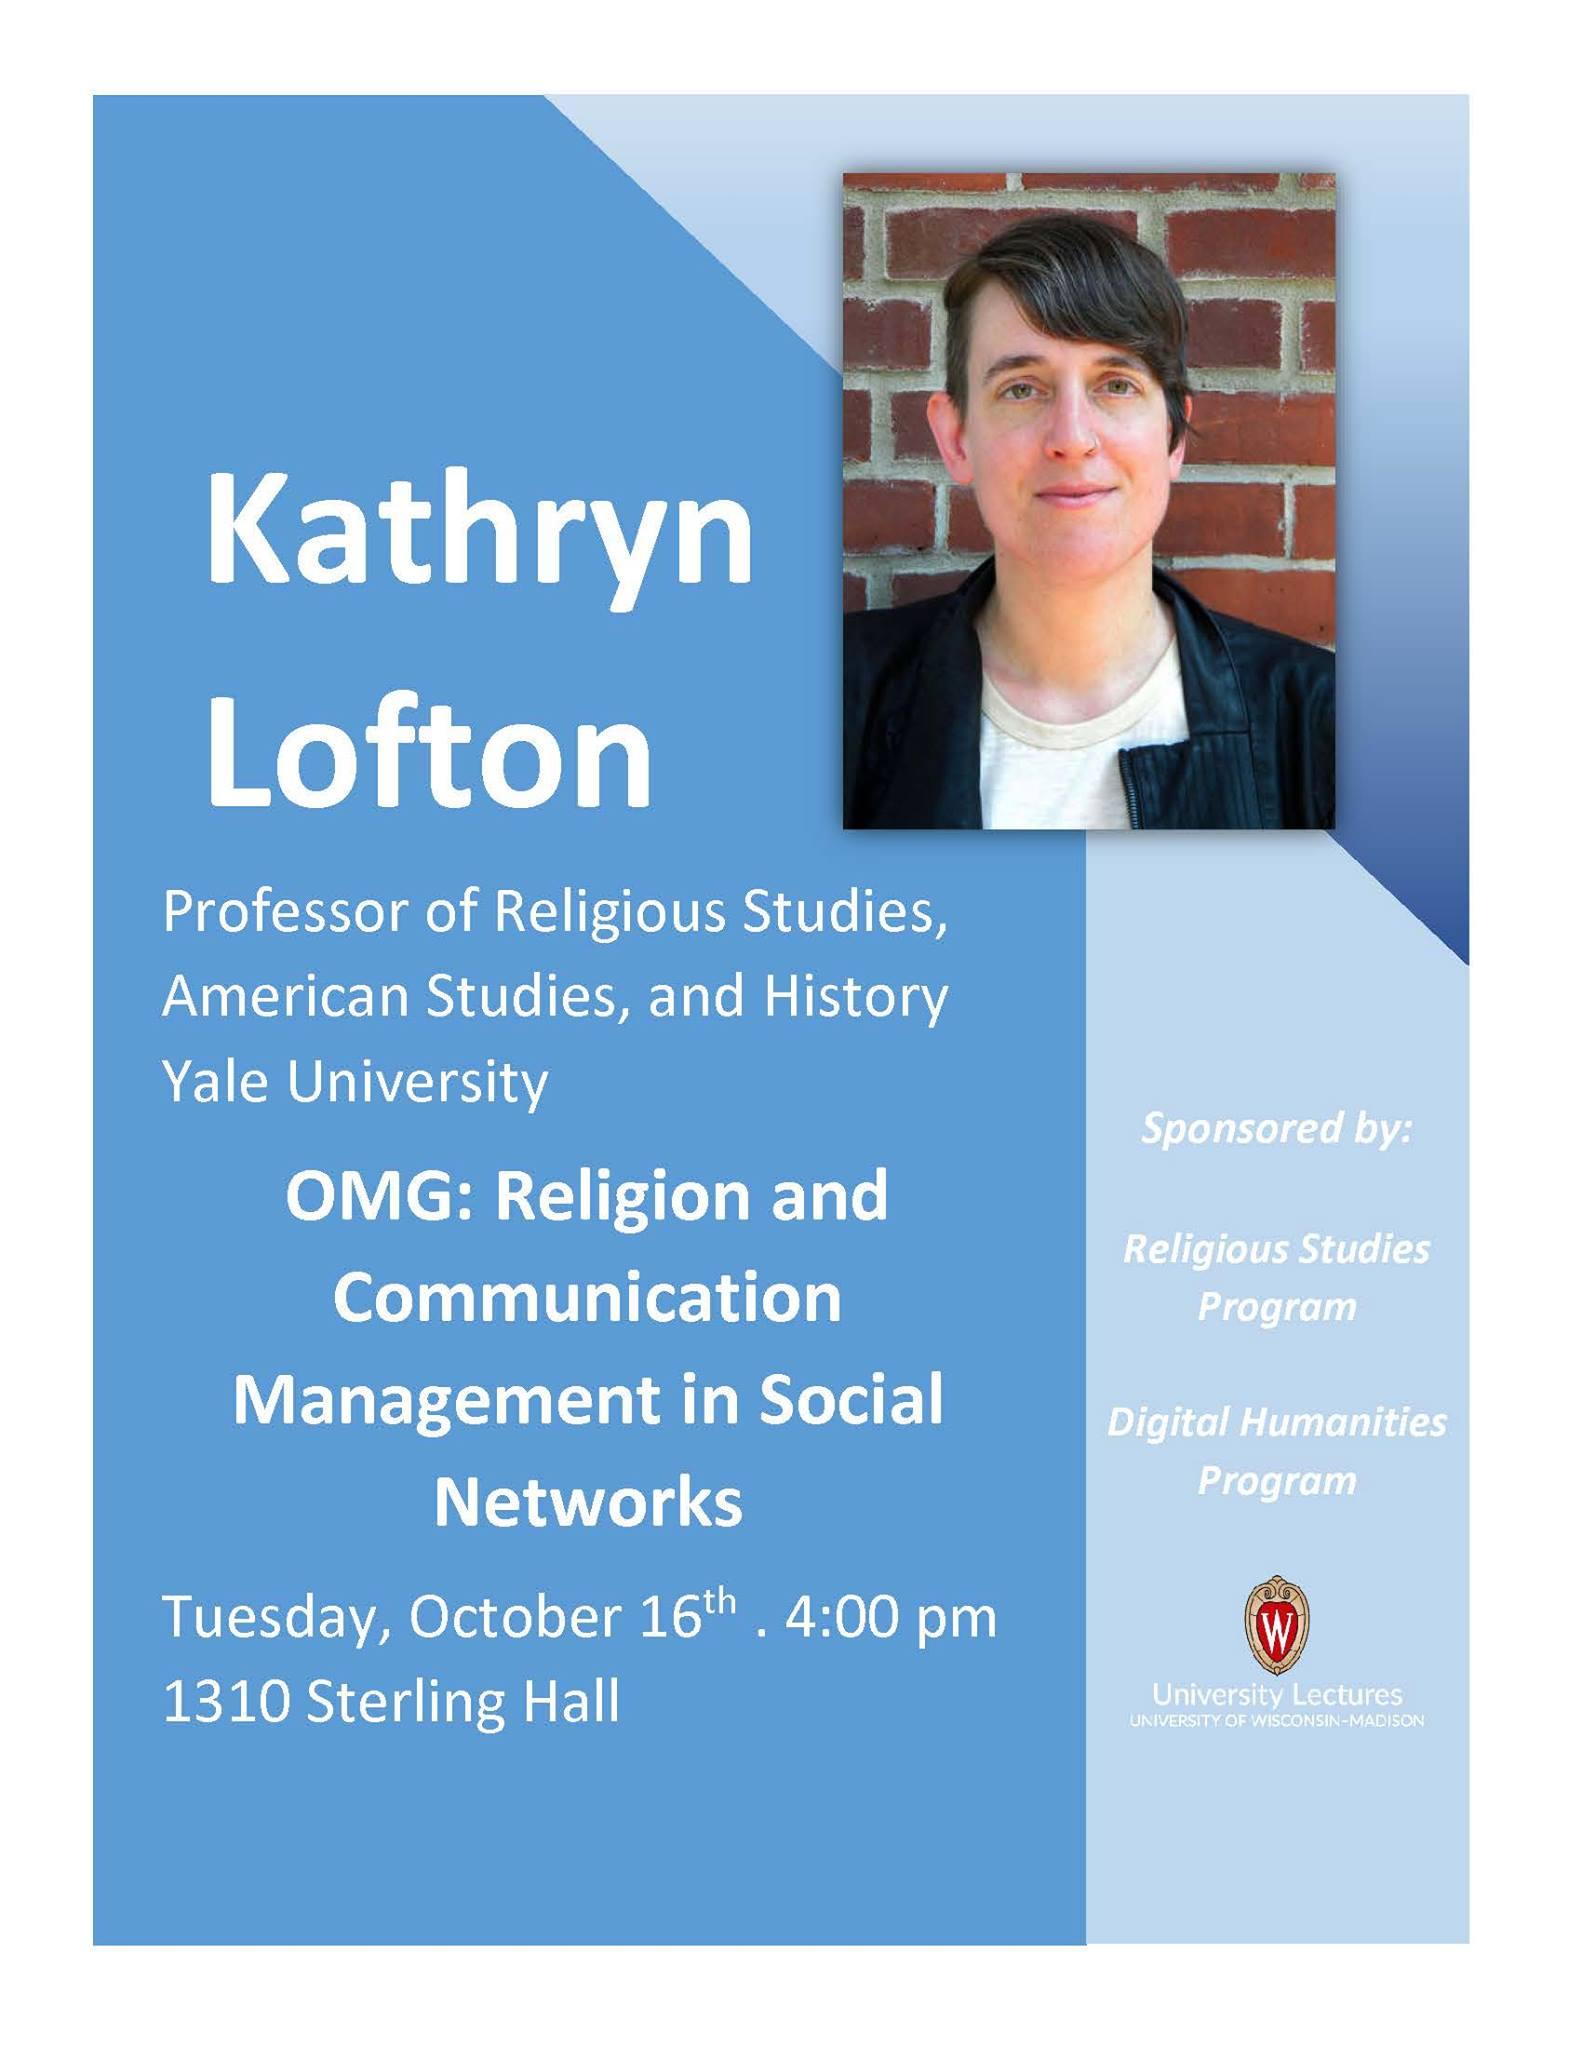 Poster for Kathryn Lofton's talk